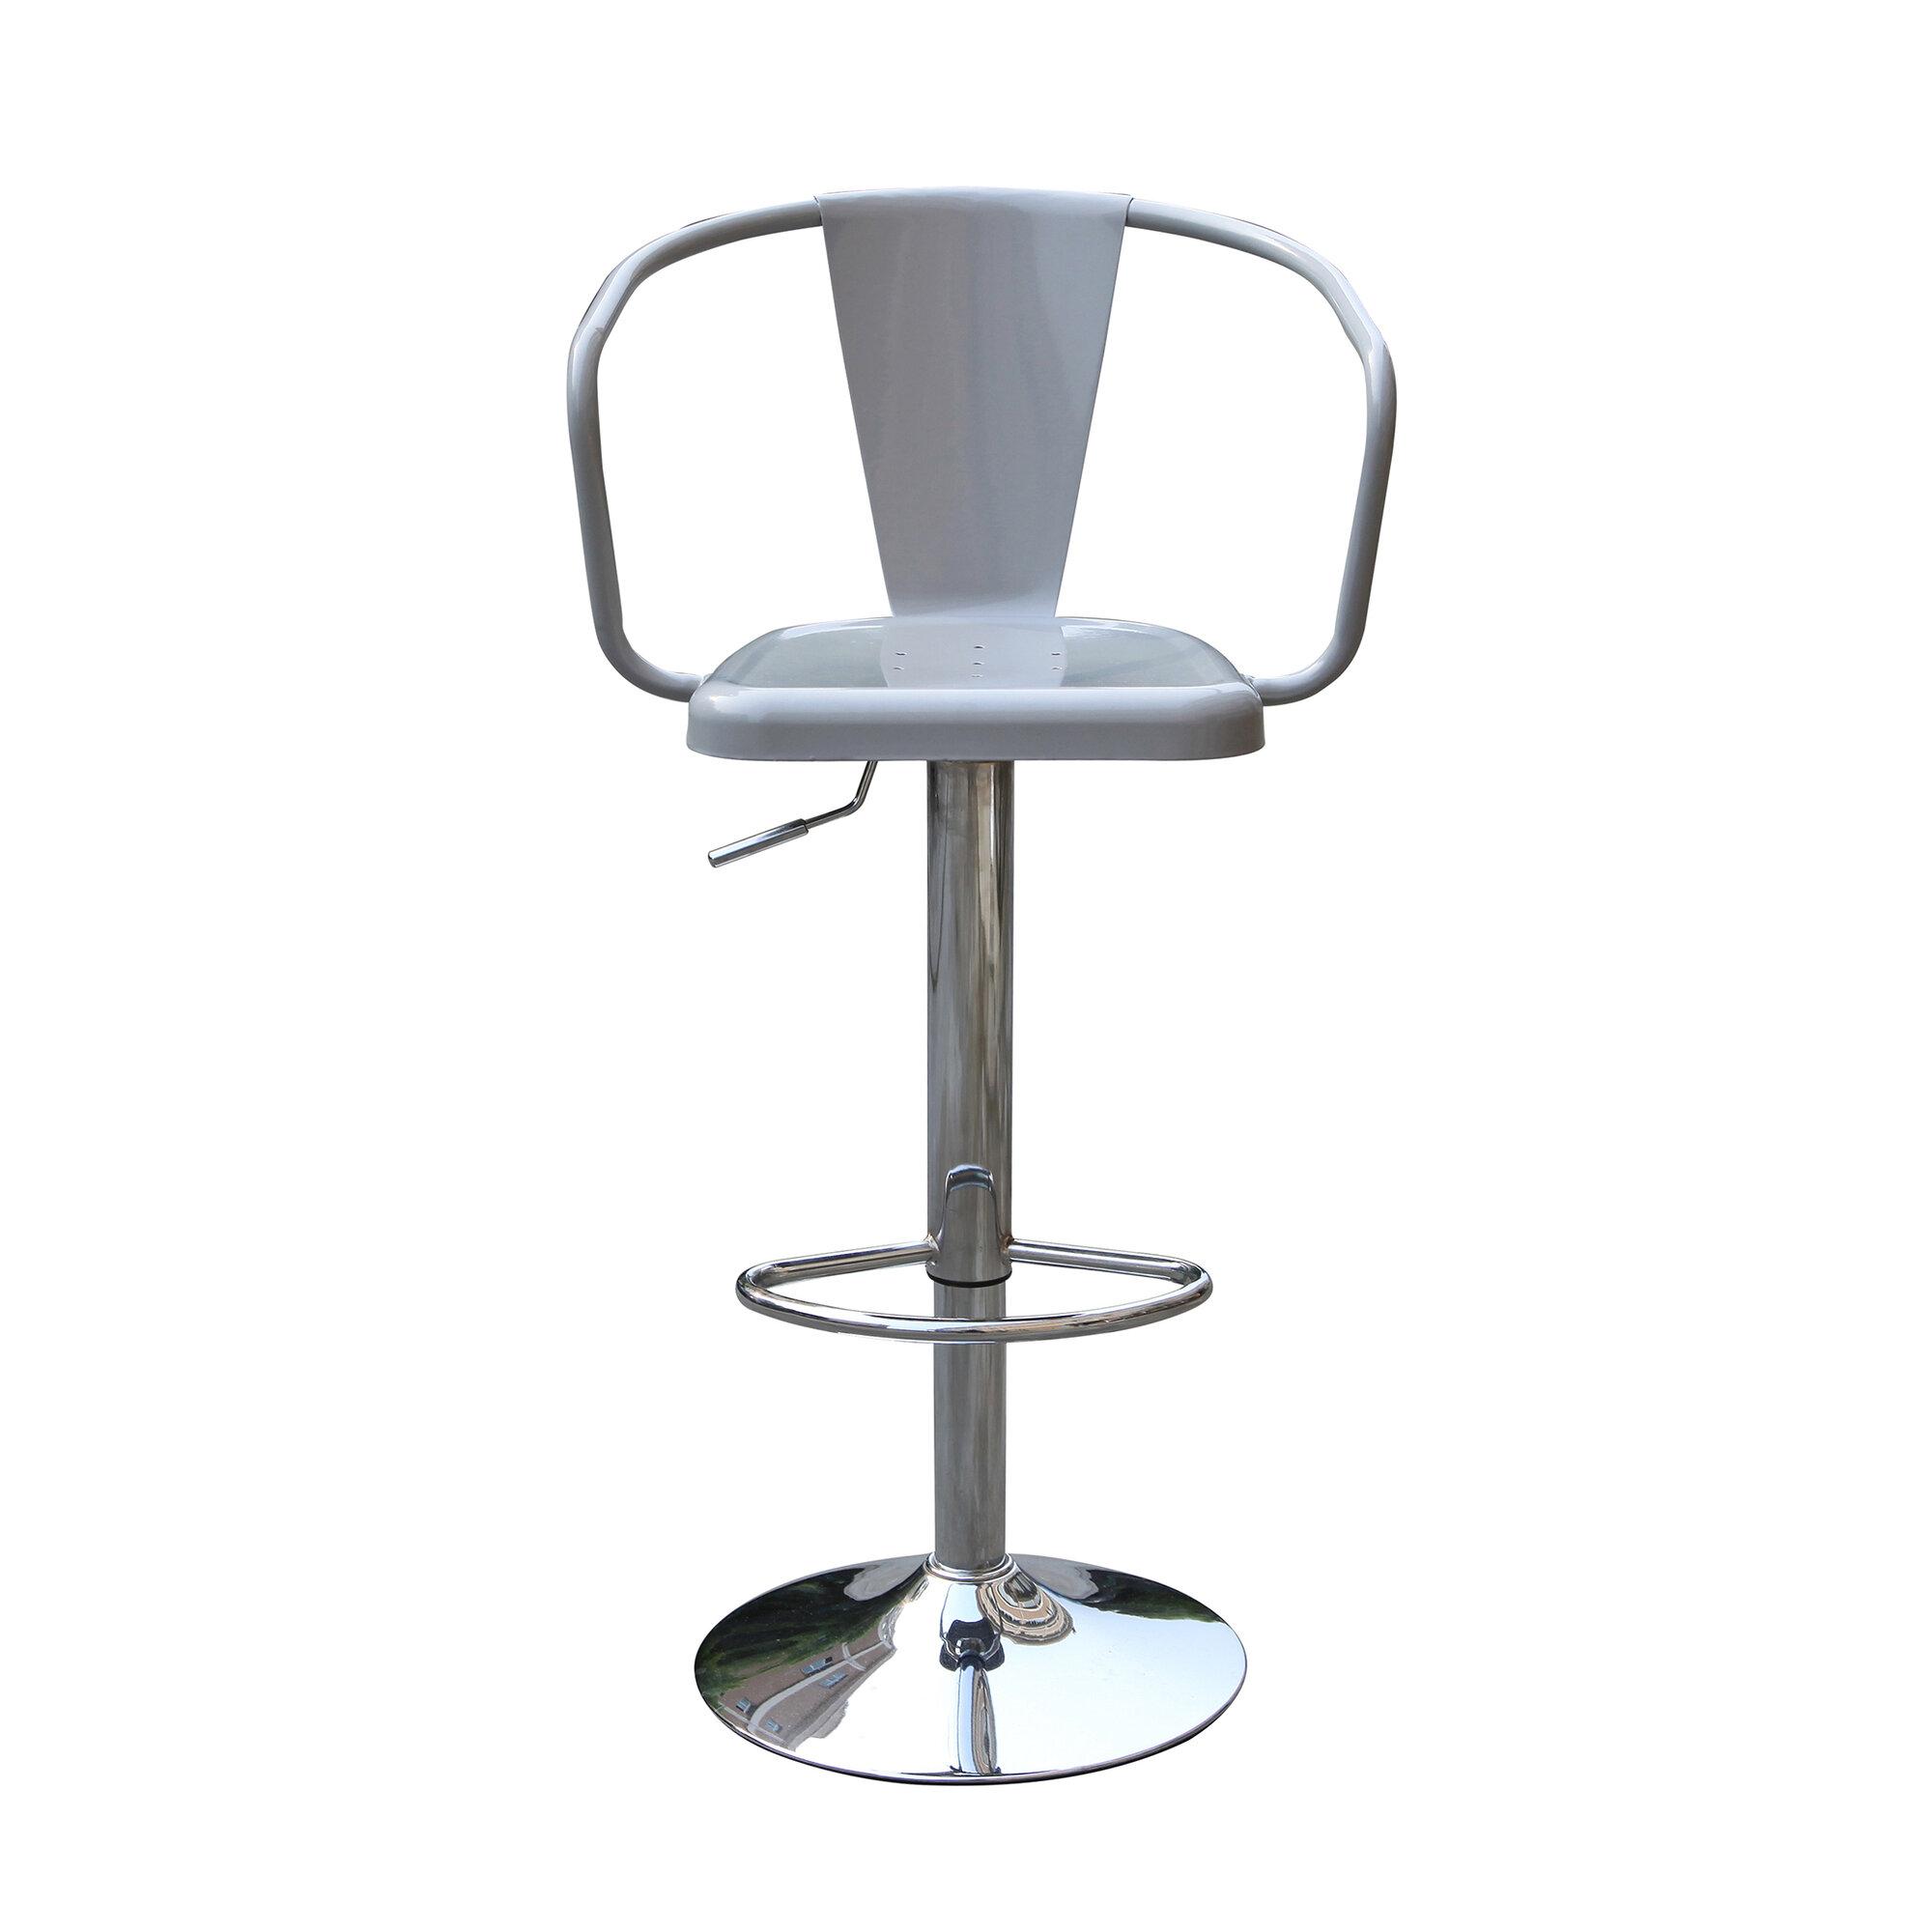 Techni Mobili Adjustable Height Swivel Bar Stool Set of 2  : 1 from www.ebay.com size 2000 x 2000 jpeg 175kB